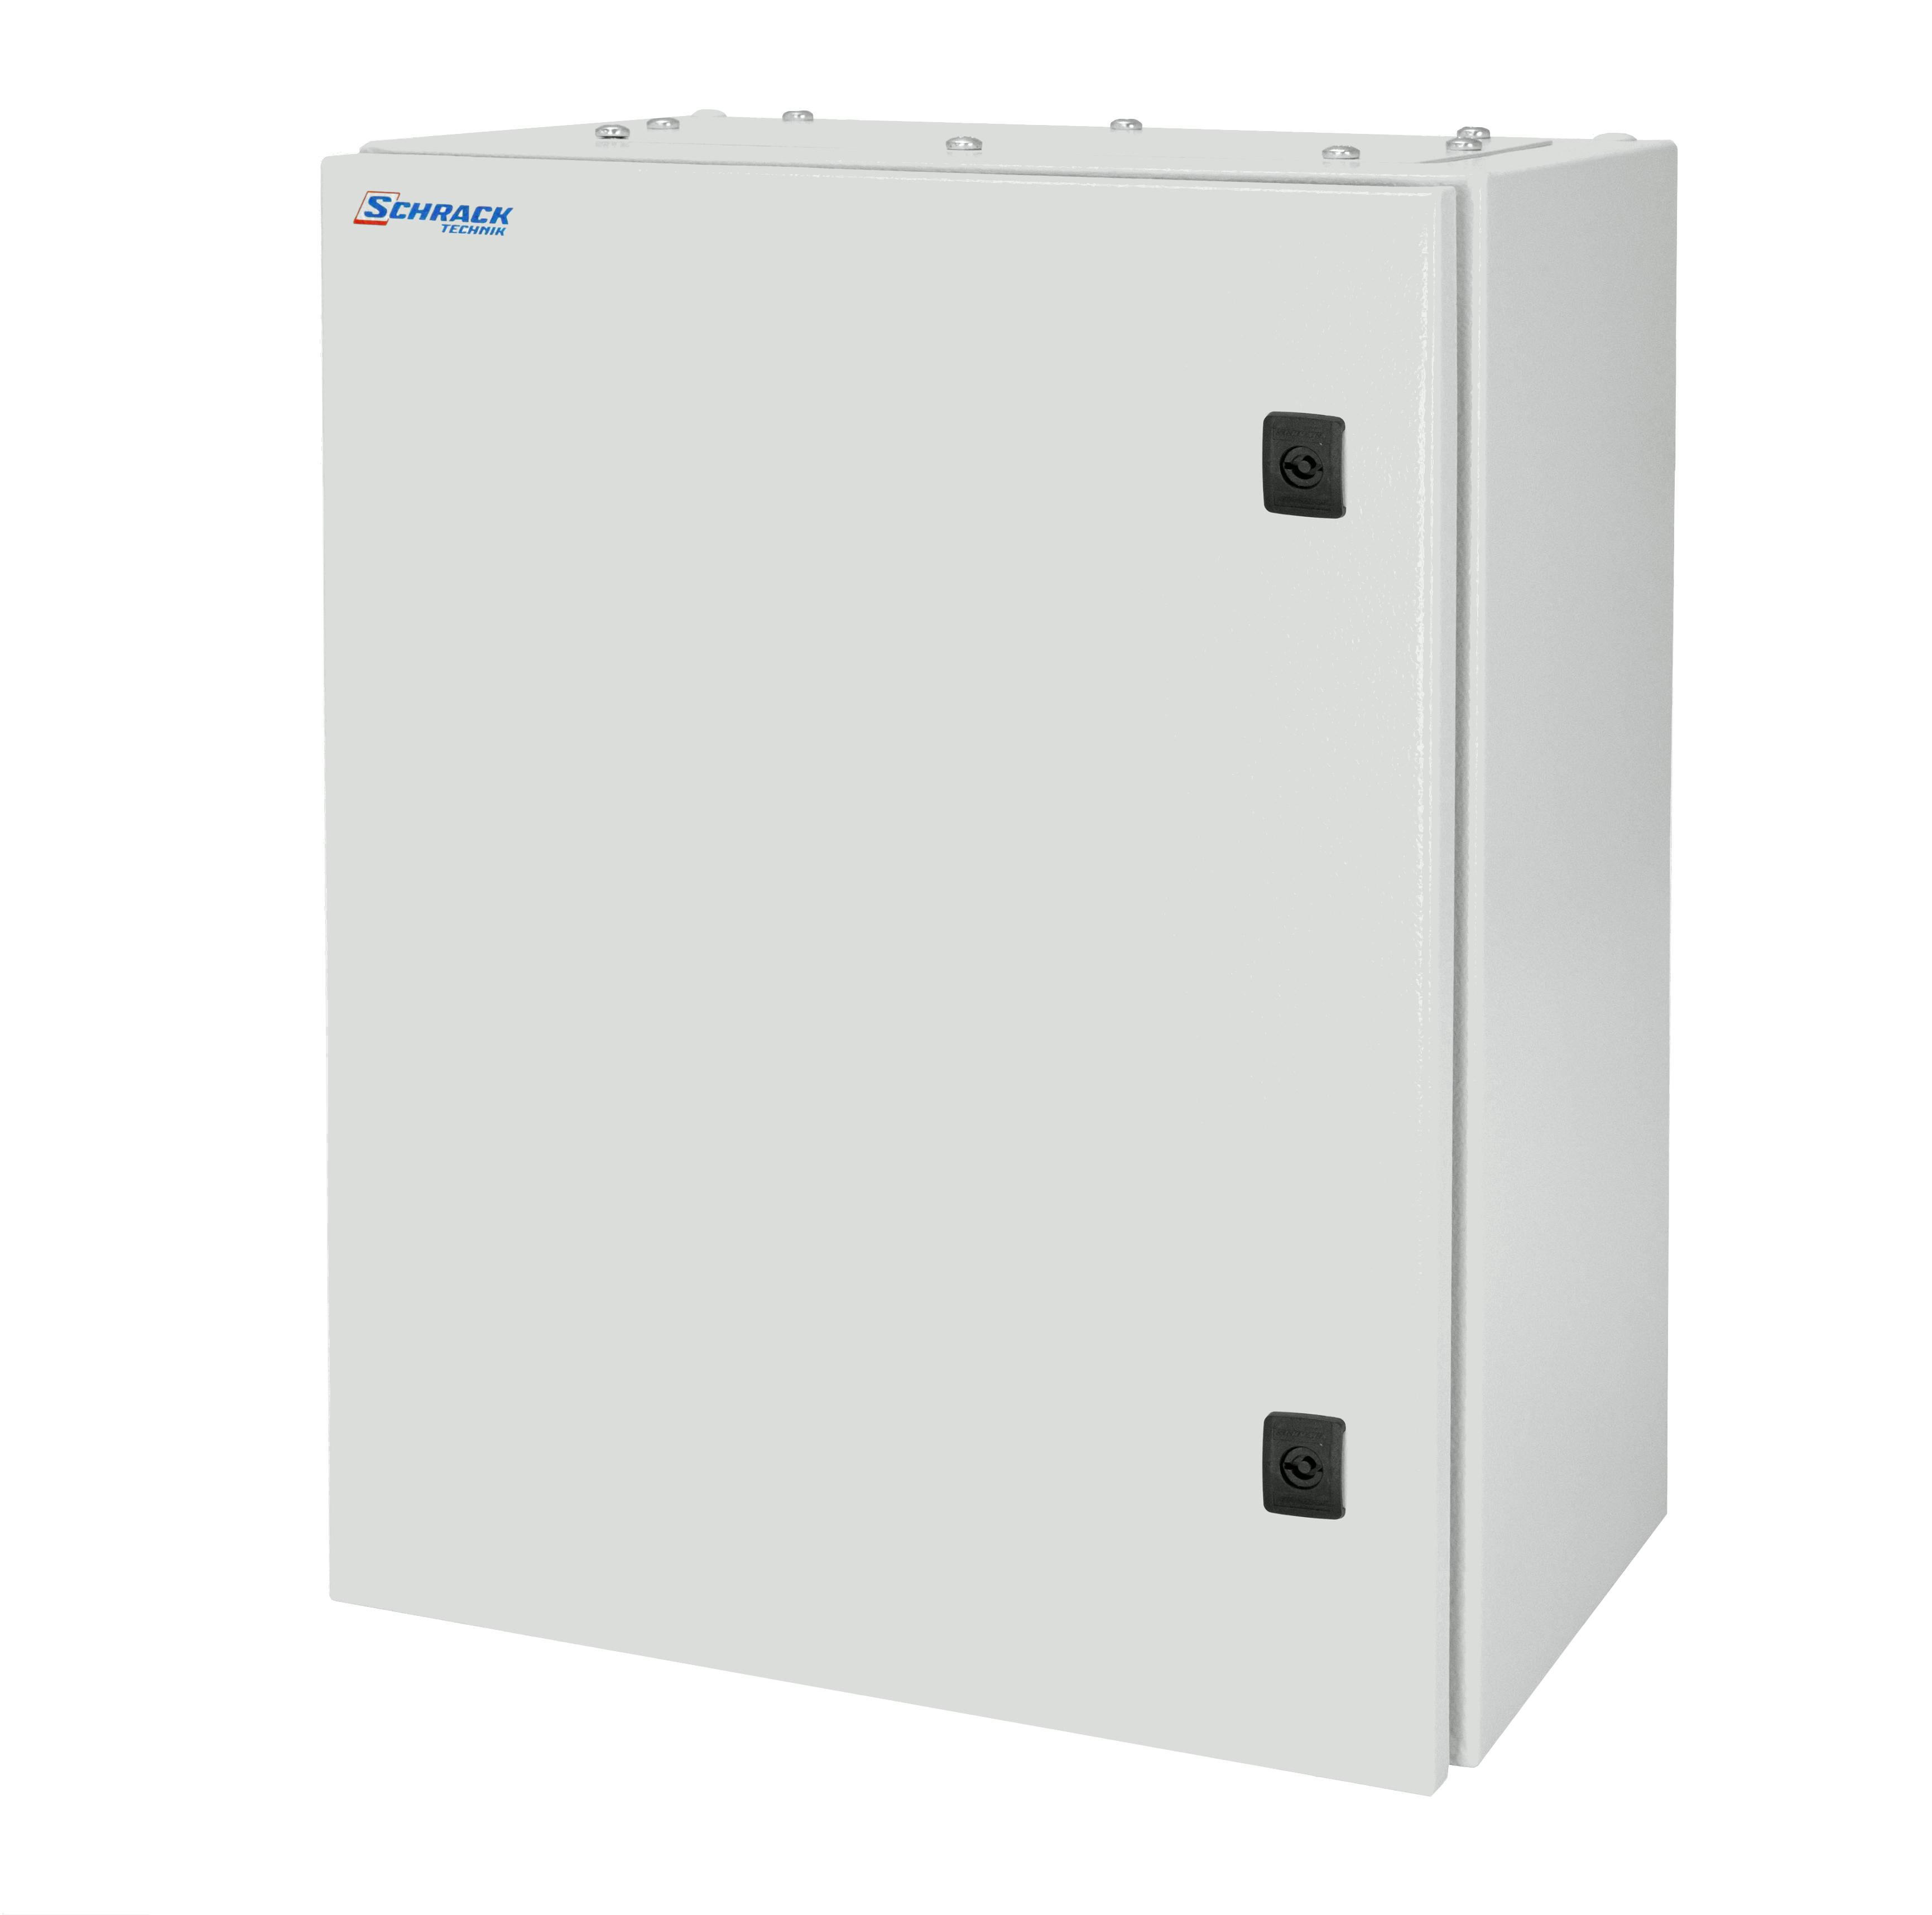 1 Stk Wandschrank Mono IP66 H=600 B=500 T=300 Stahlblech WSM6050300